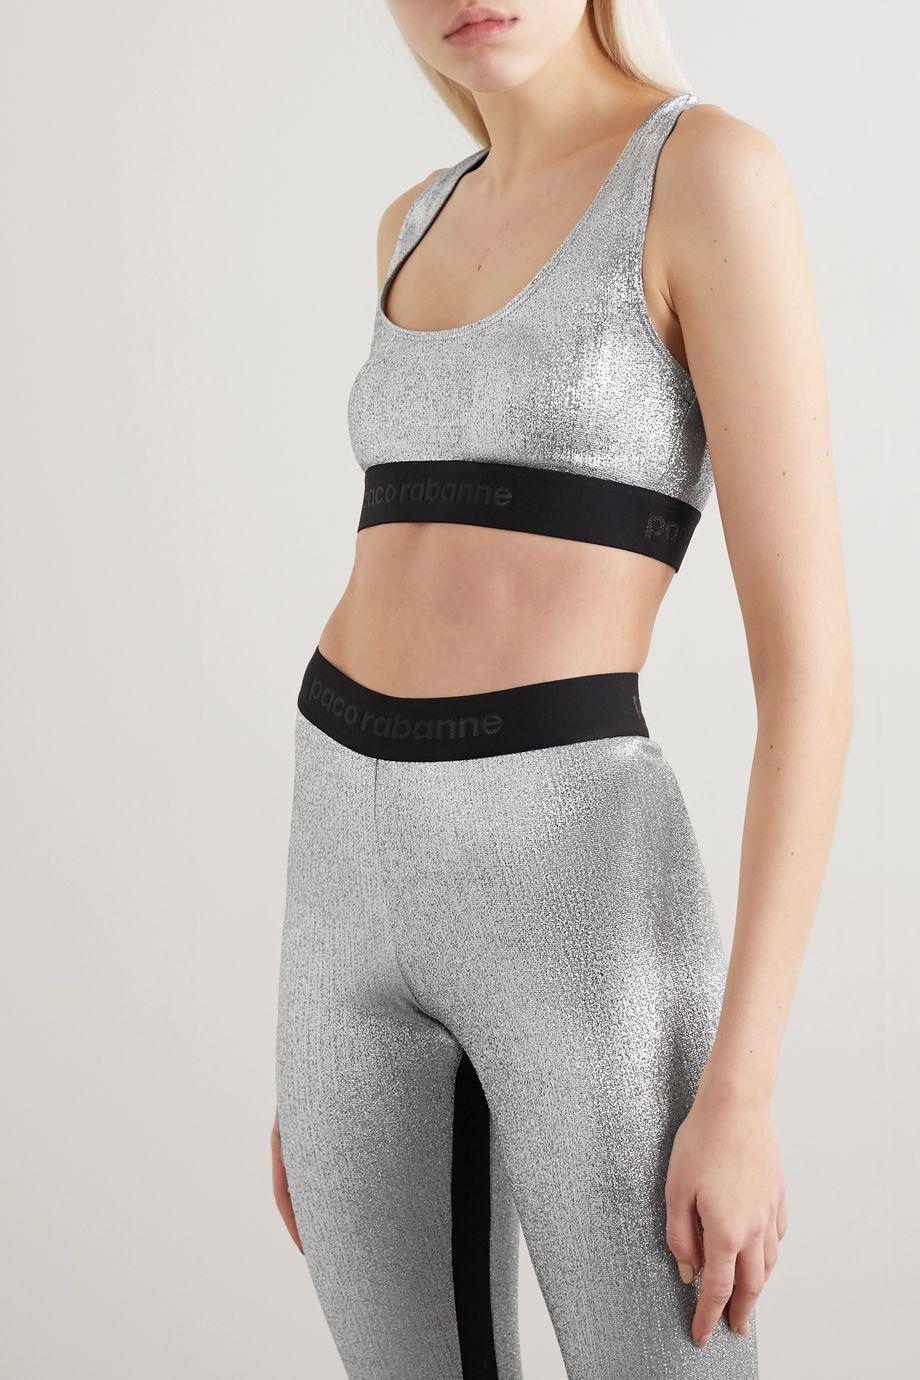 Paco Rabanne Two-tone metallic stretch sports bra